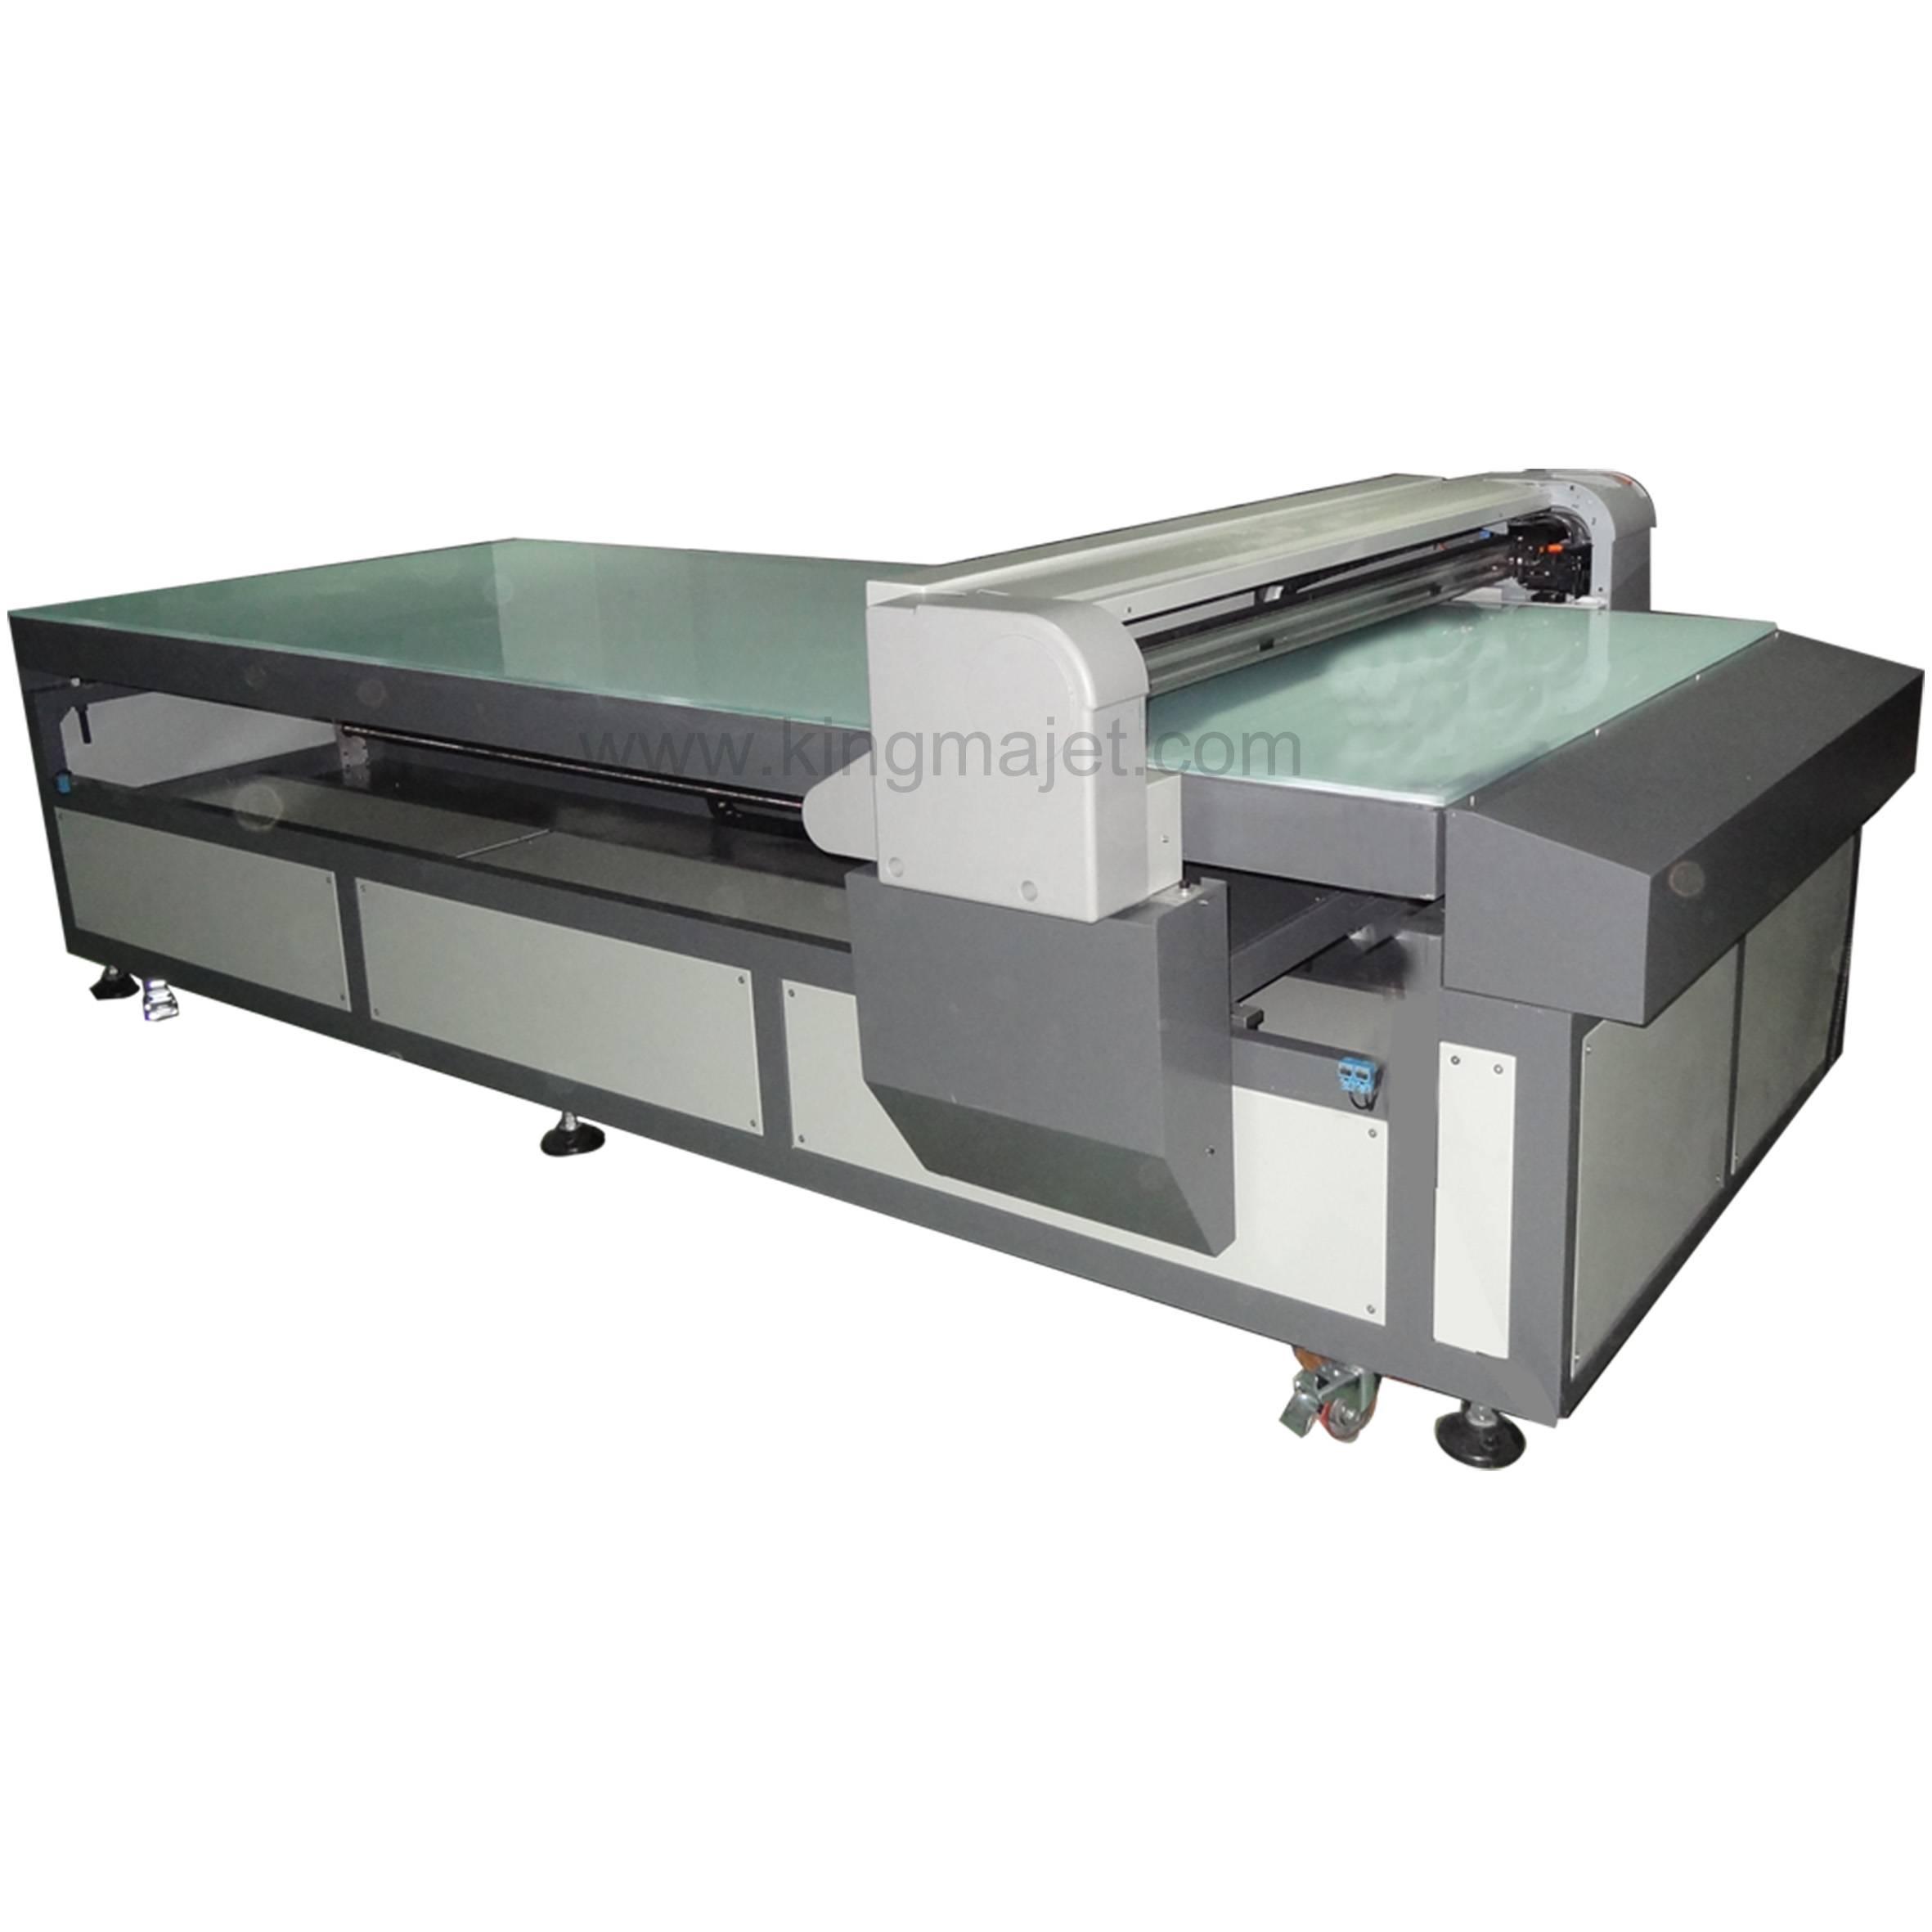 Weihang MJ1325-4 color color Inkjet Digital Printer